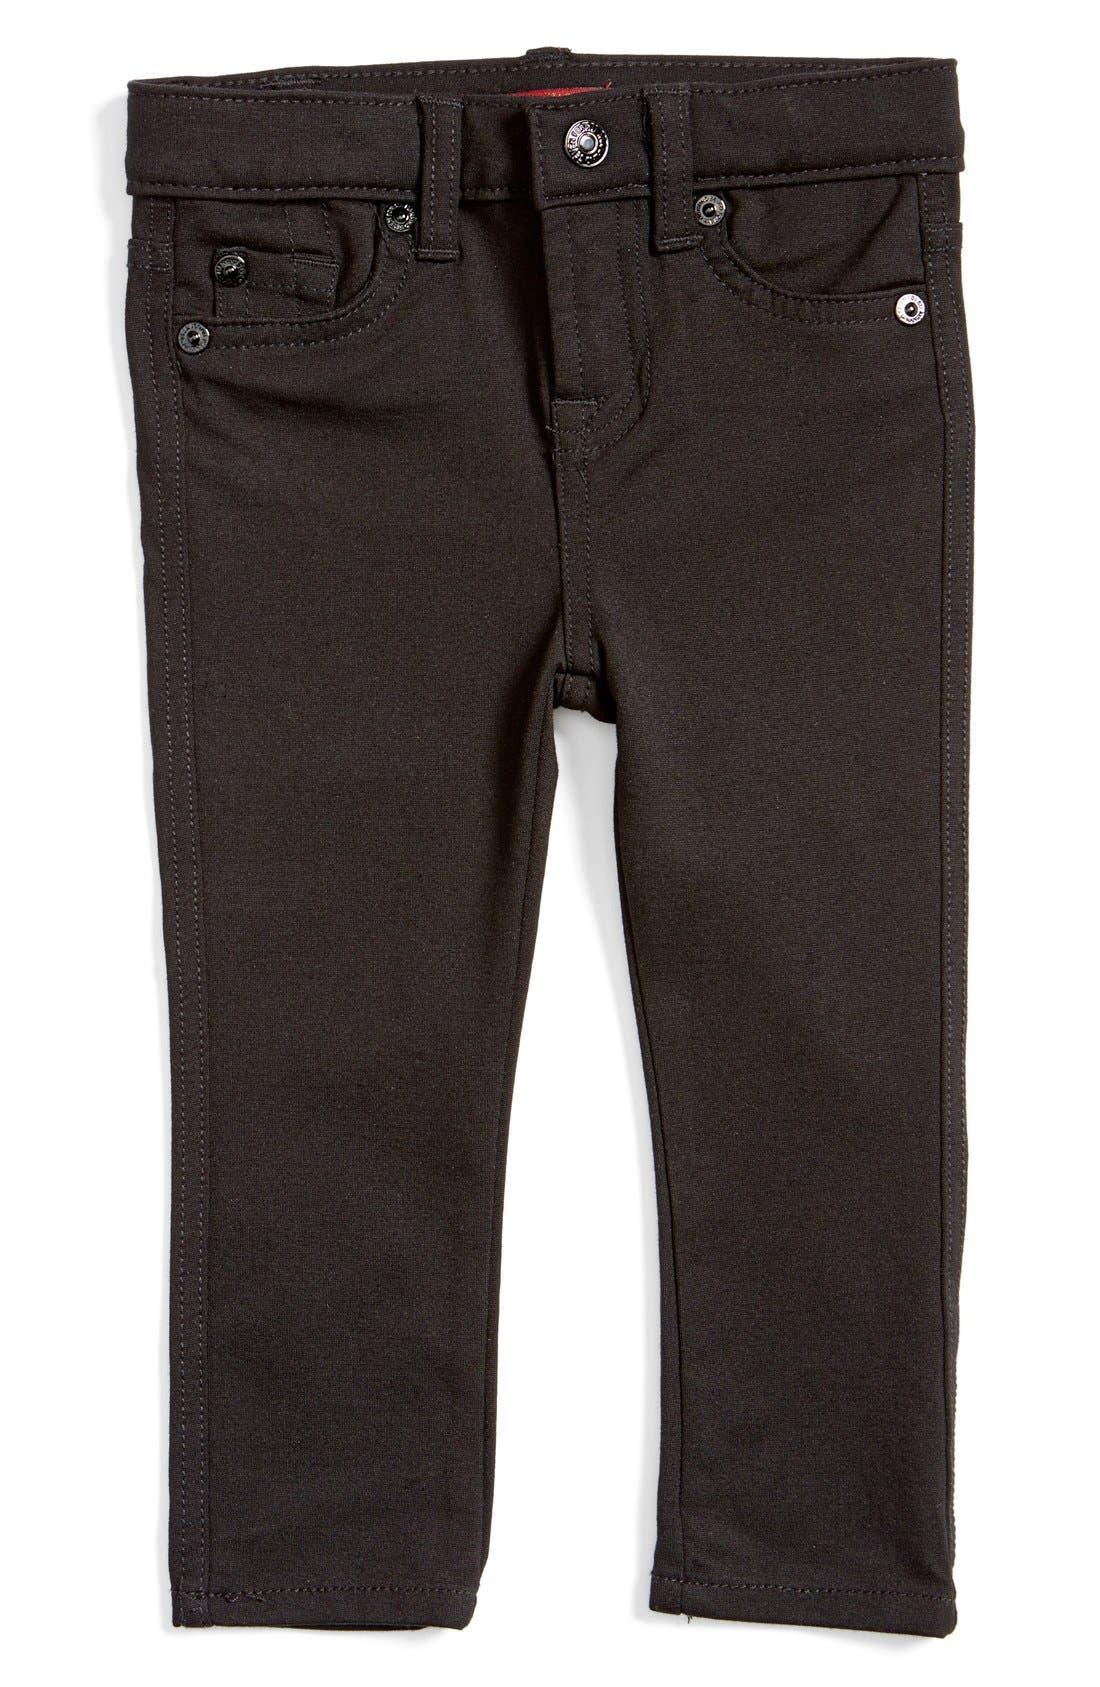 Skinny Fit Jeans,                         Main,                         color, Black